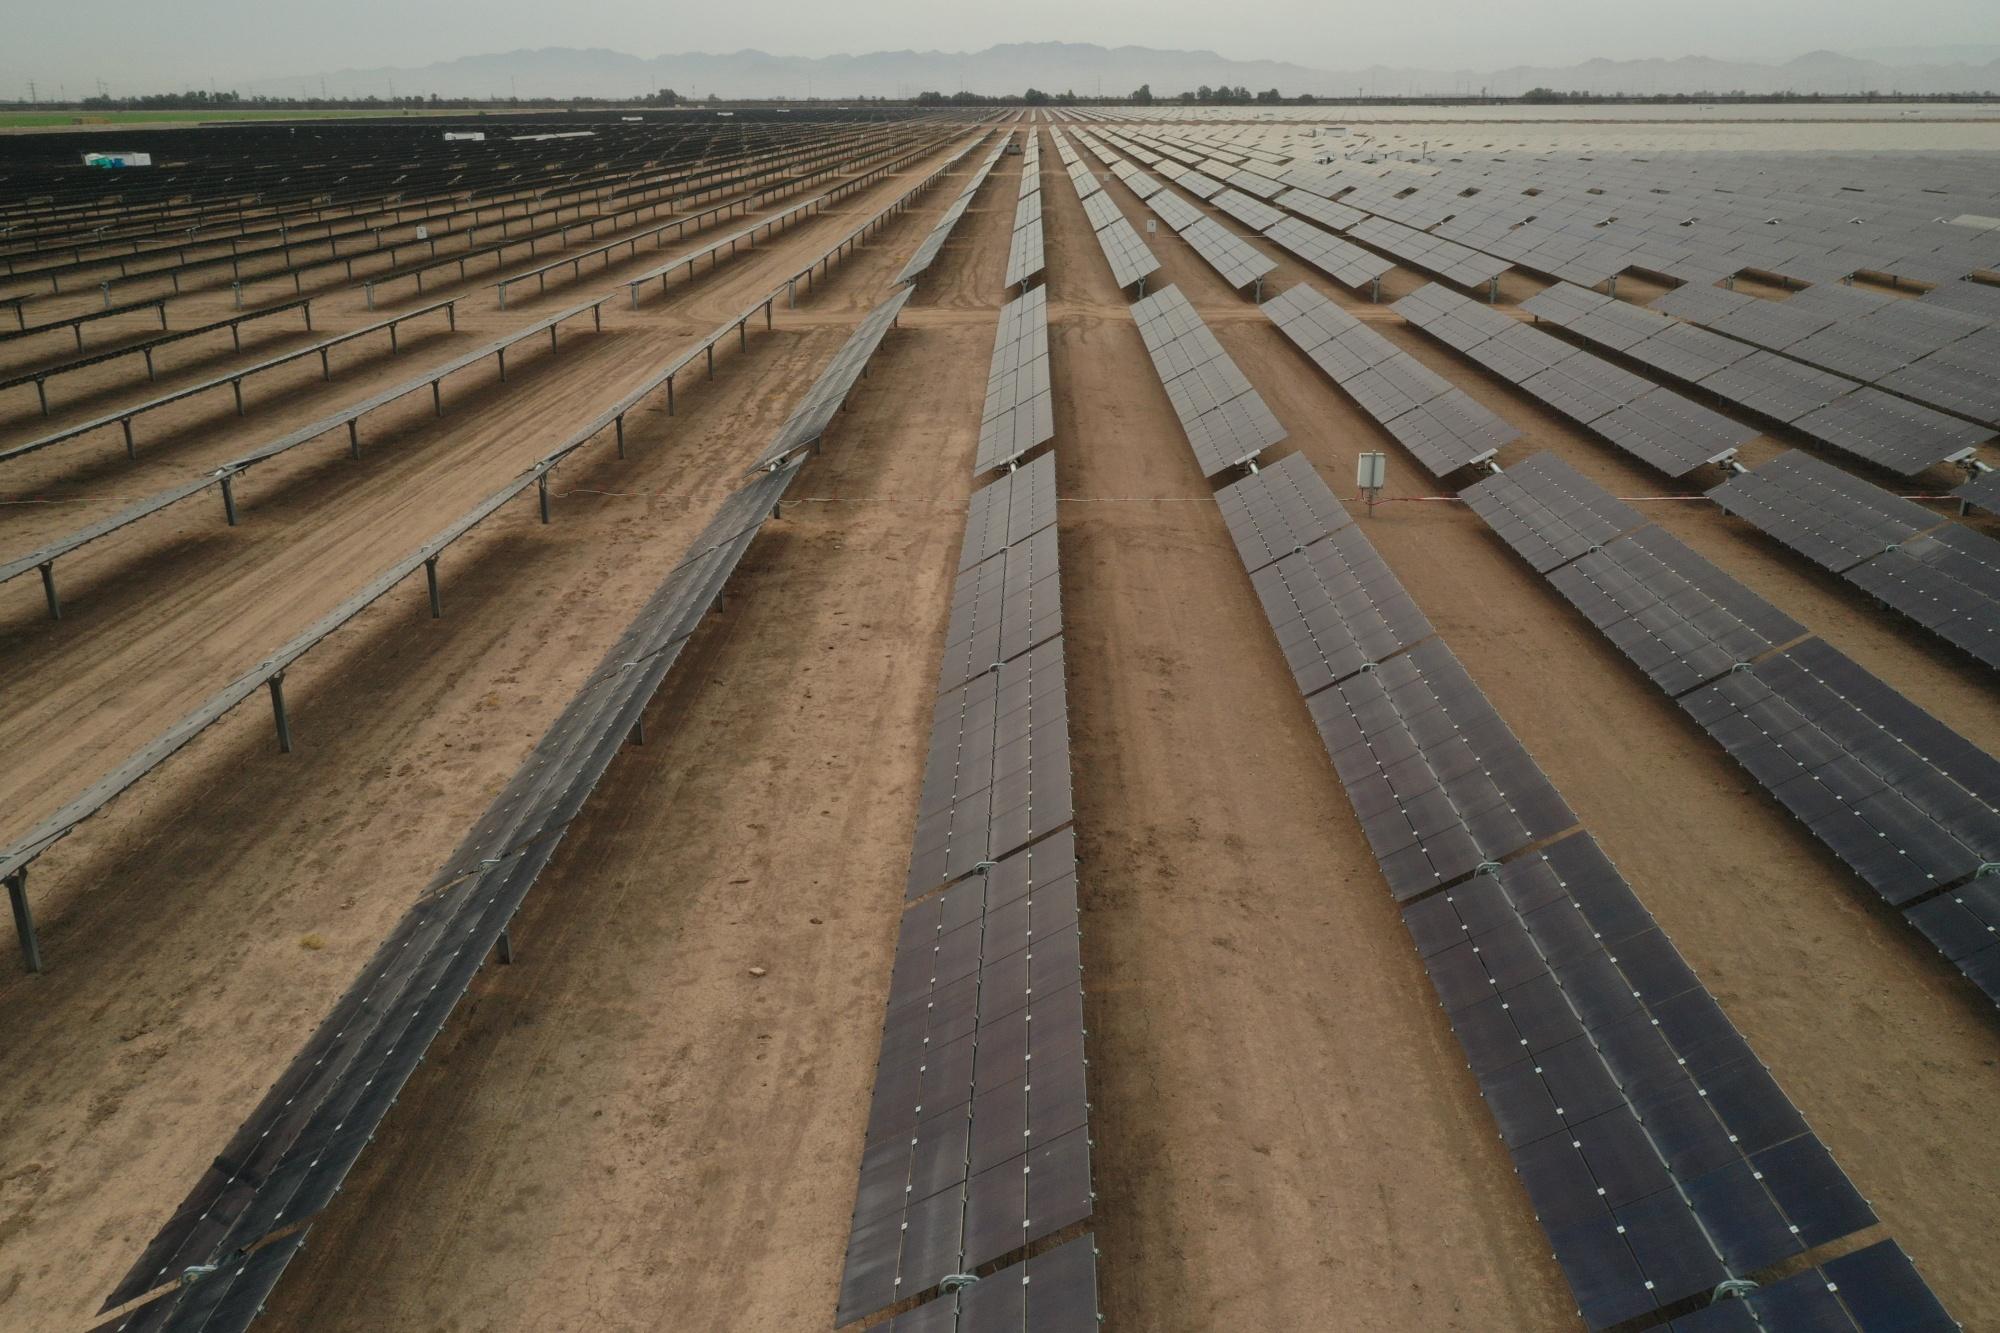 Trump Faces Another Legal Battle Over Stiffer Solar Tariffs